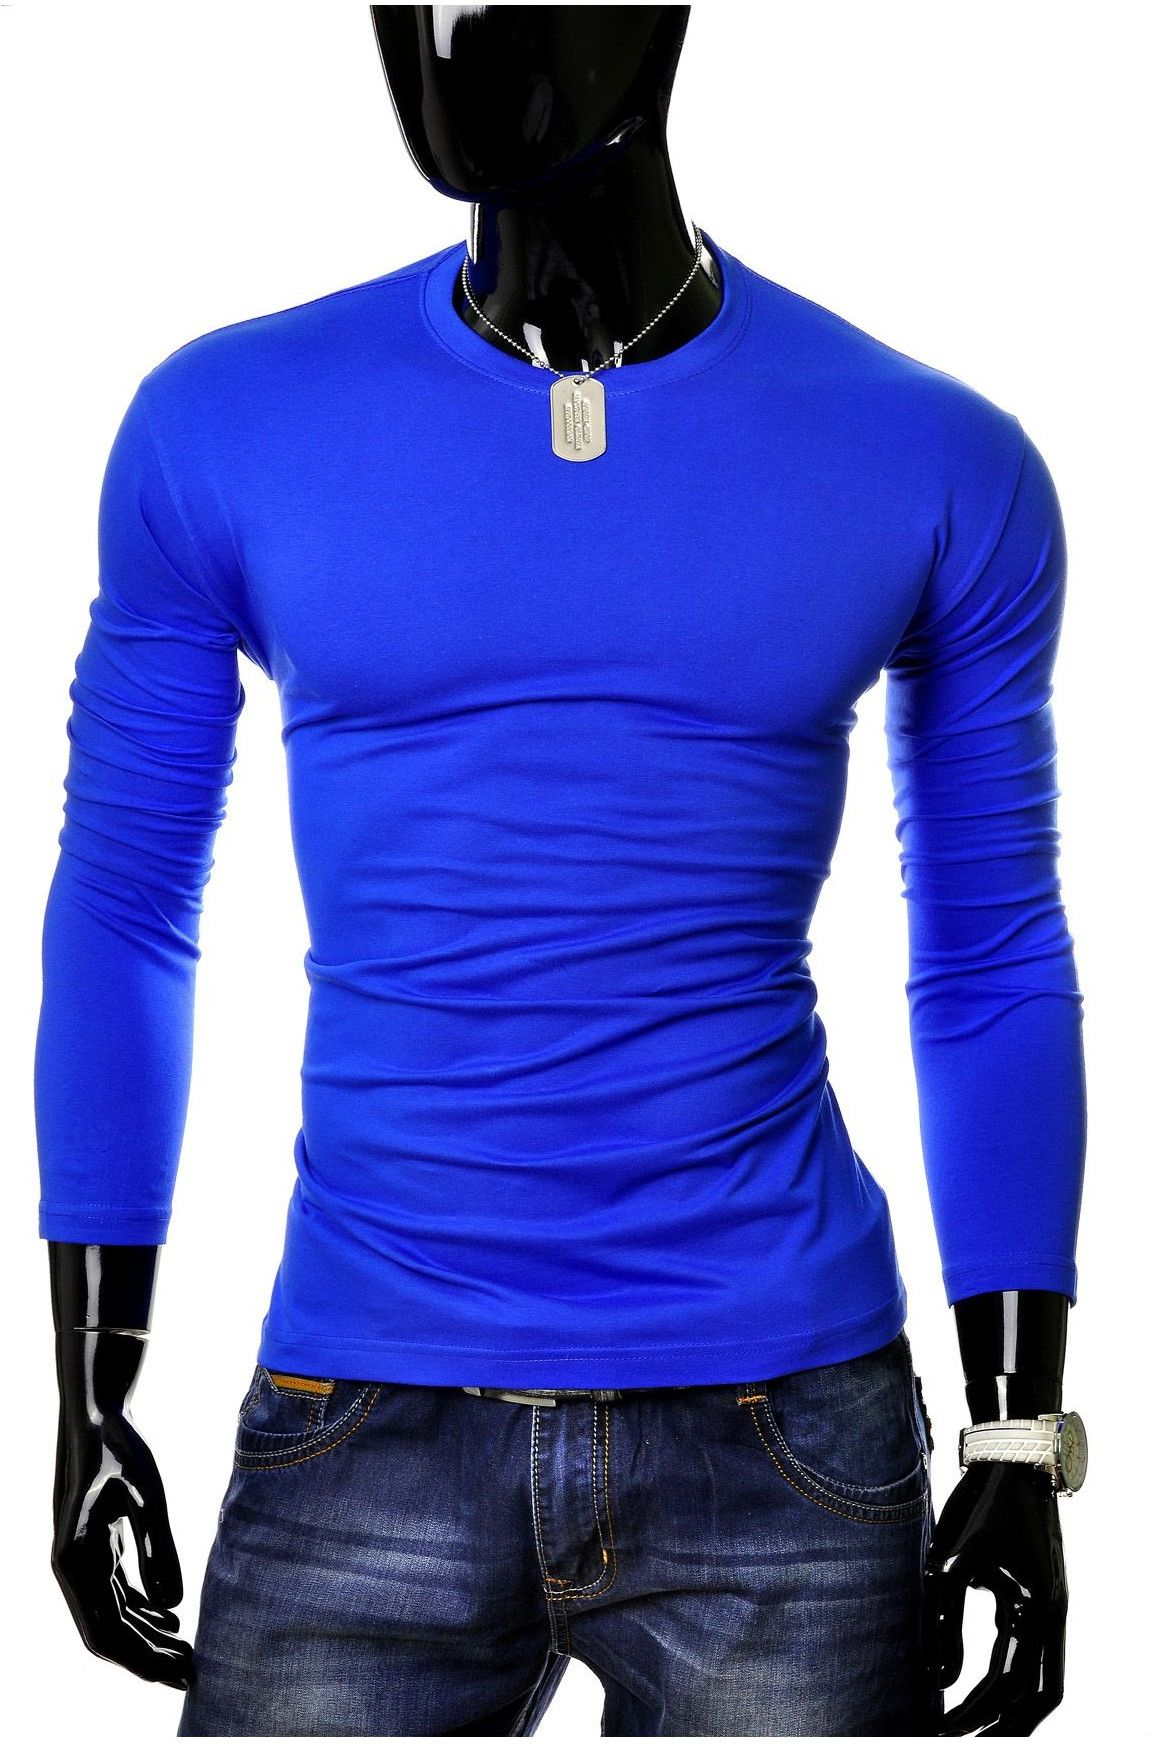 Bluza męska longsleeve JL5 - niebieska